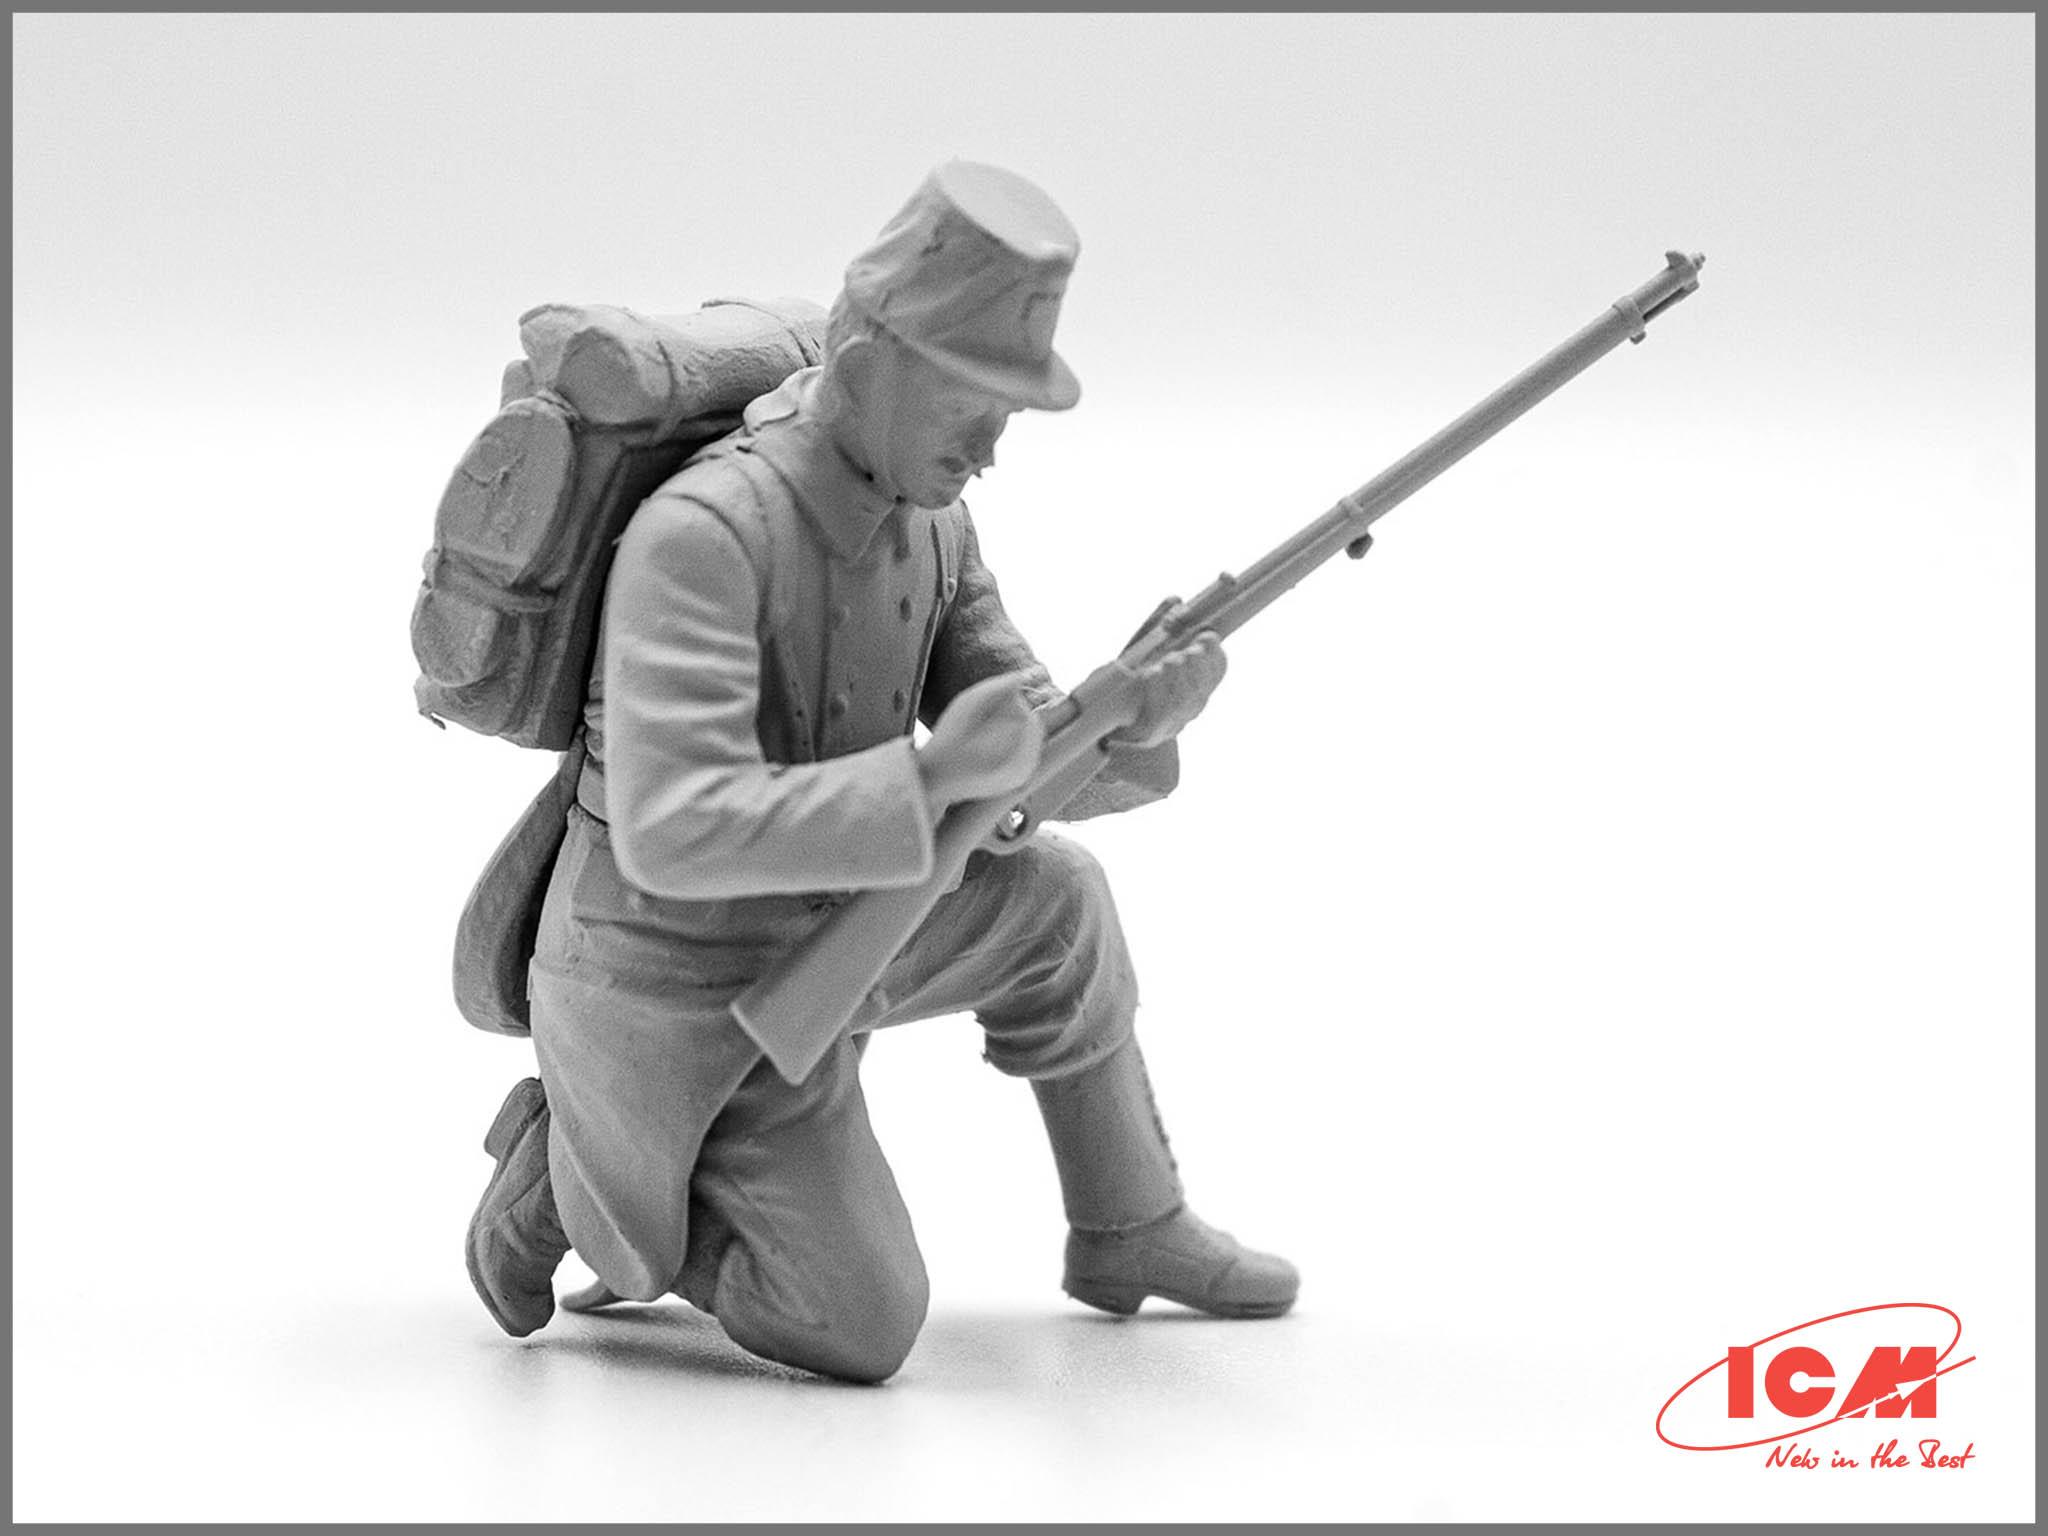 35680_cropped_Belgian_infantry_icm_3